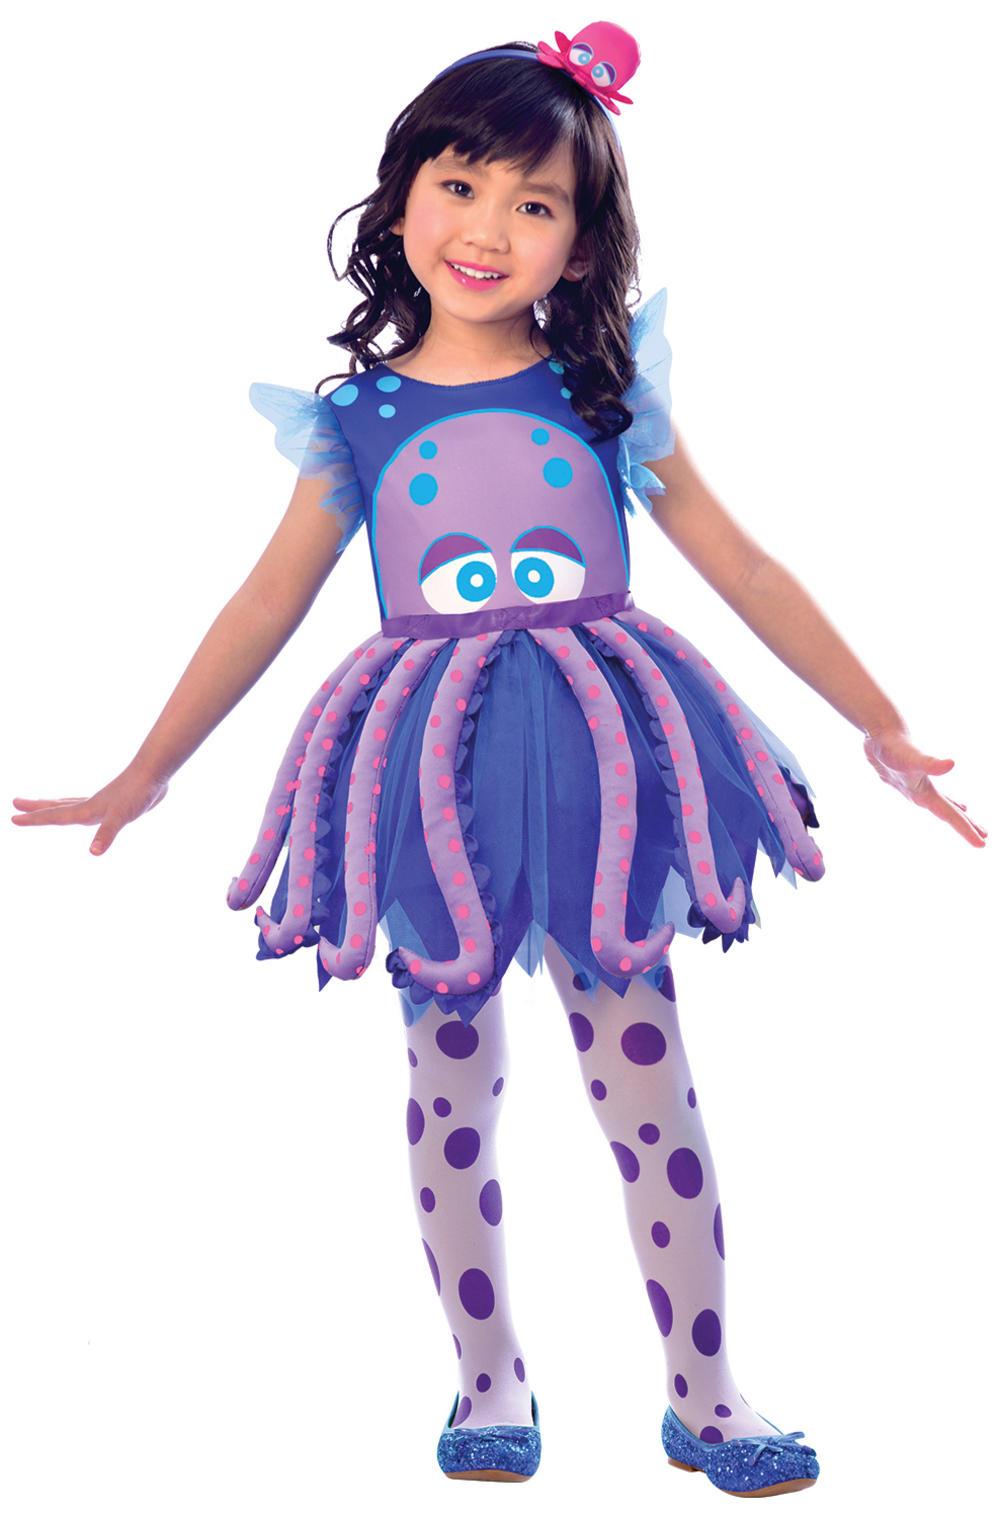 Octopus Girls Fancy Dress Sea Animal Childrens Kids Halloween Costume Outfit